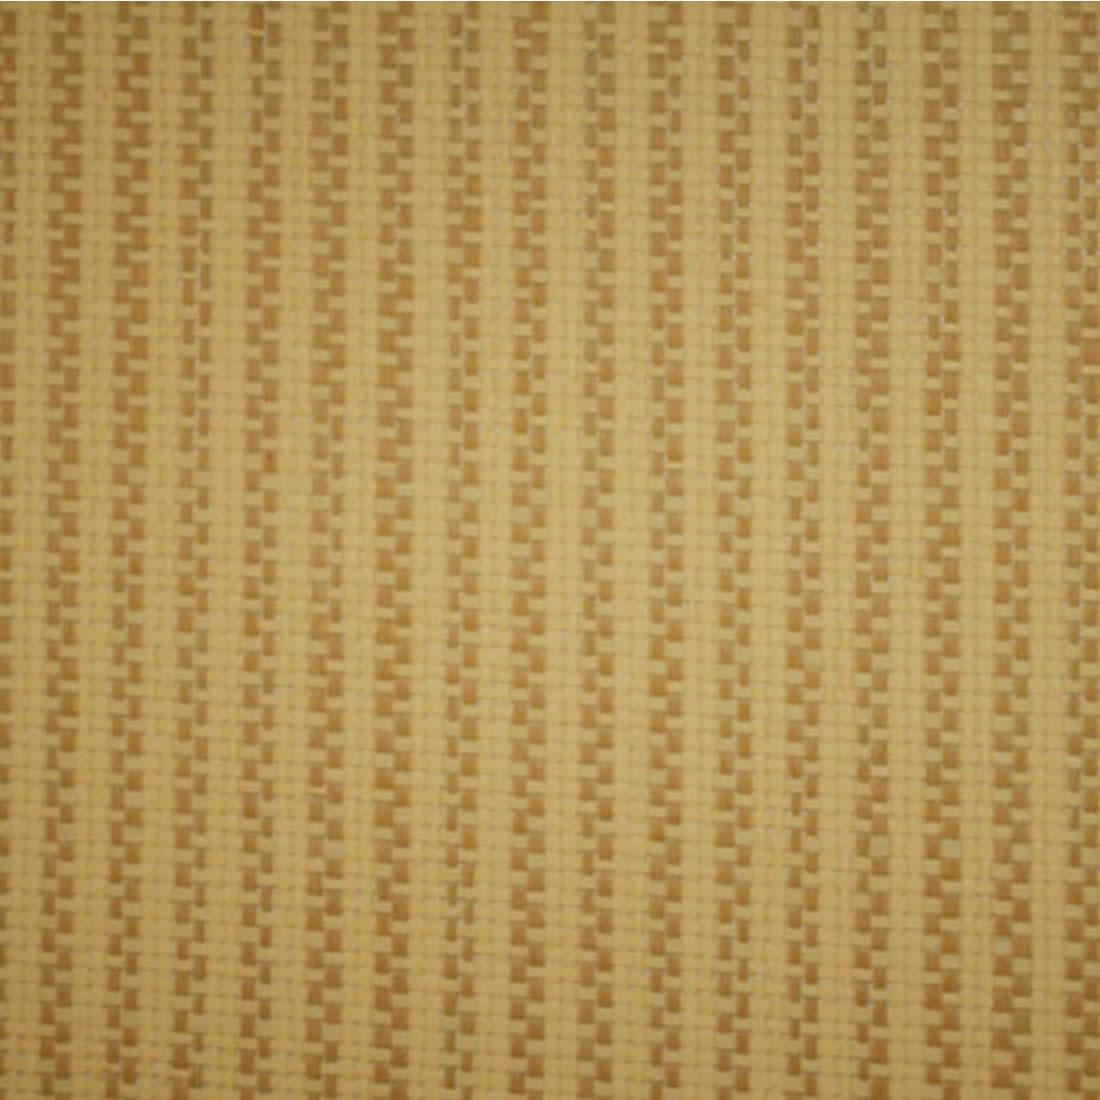 Papel de Parede Palha Natural Ref V6857 Paper Land